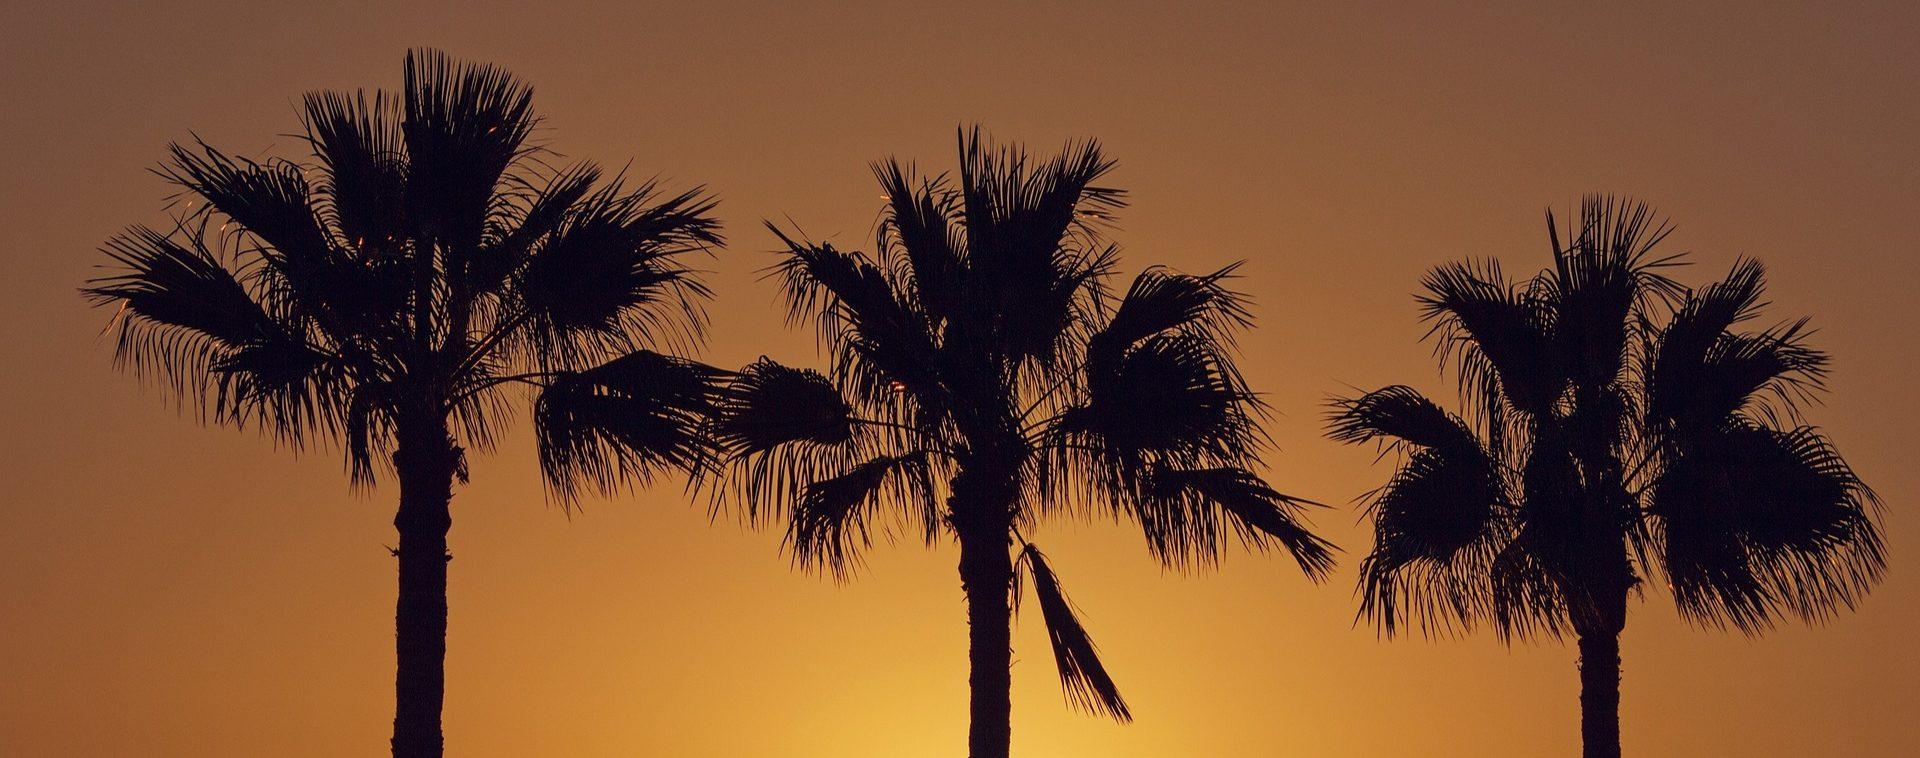 Canaries - Lanzarote et Fuerteventura - Les matins du monde